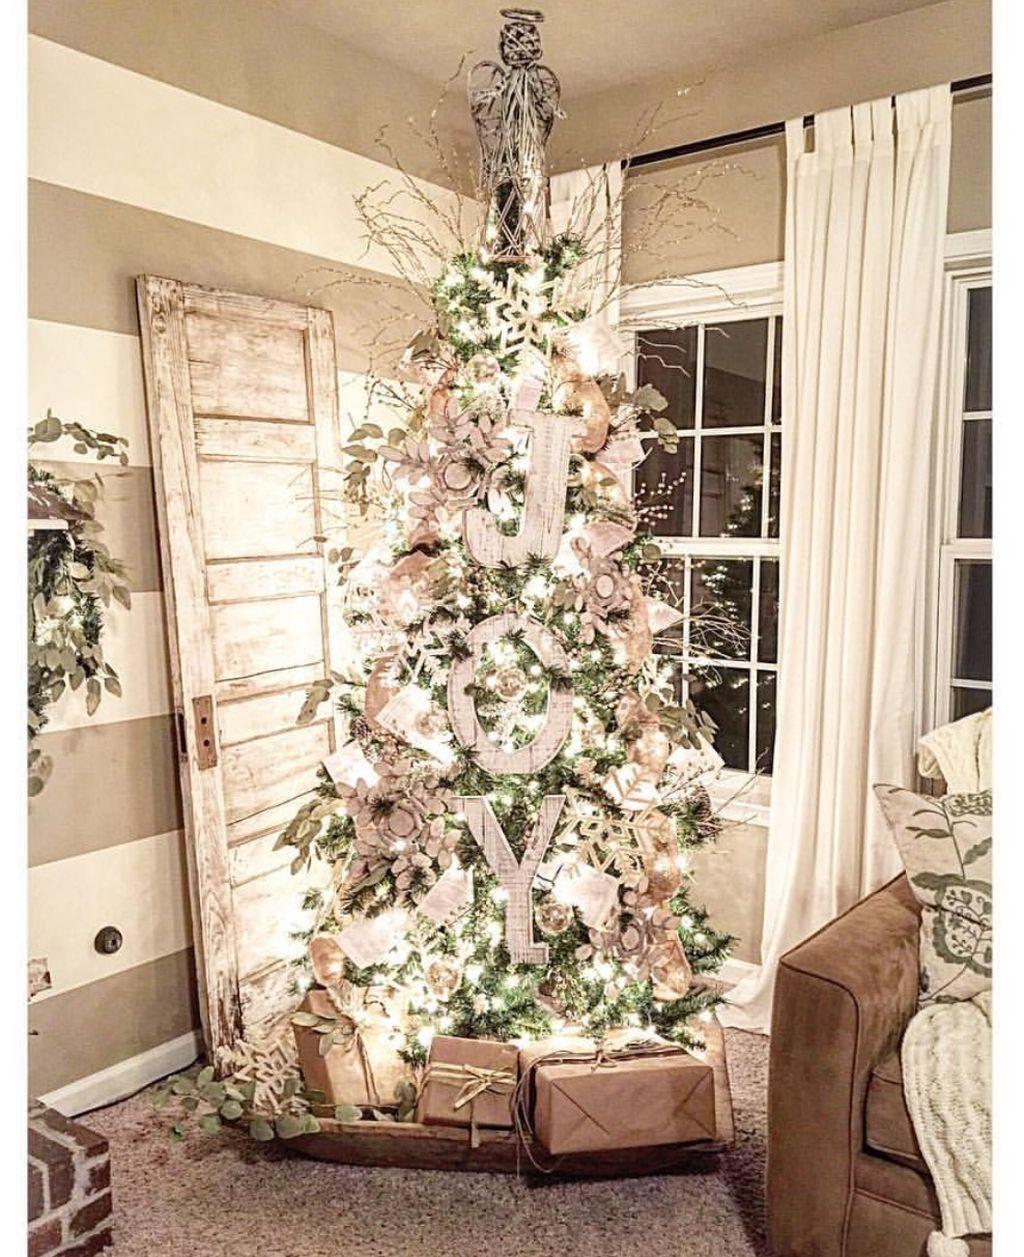 49 inspiring rustic christmas tree decoration ideas for - Decoracion navidena rustica ...